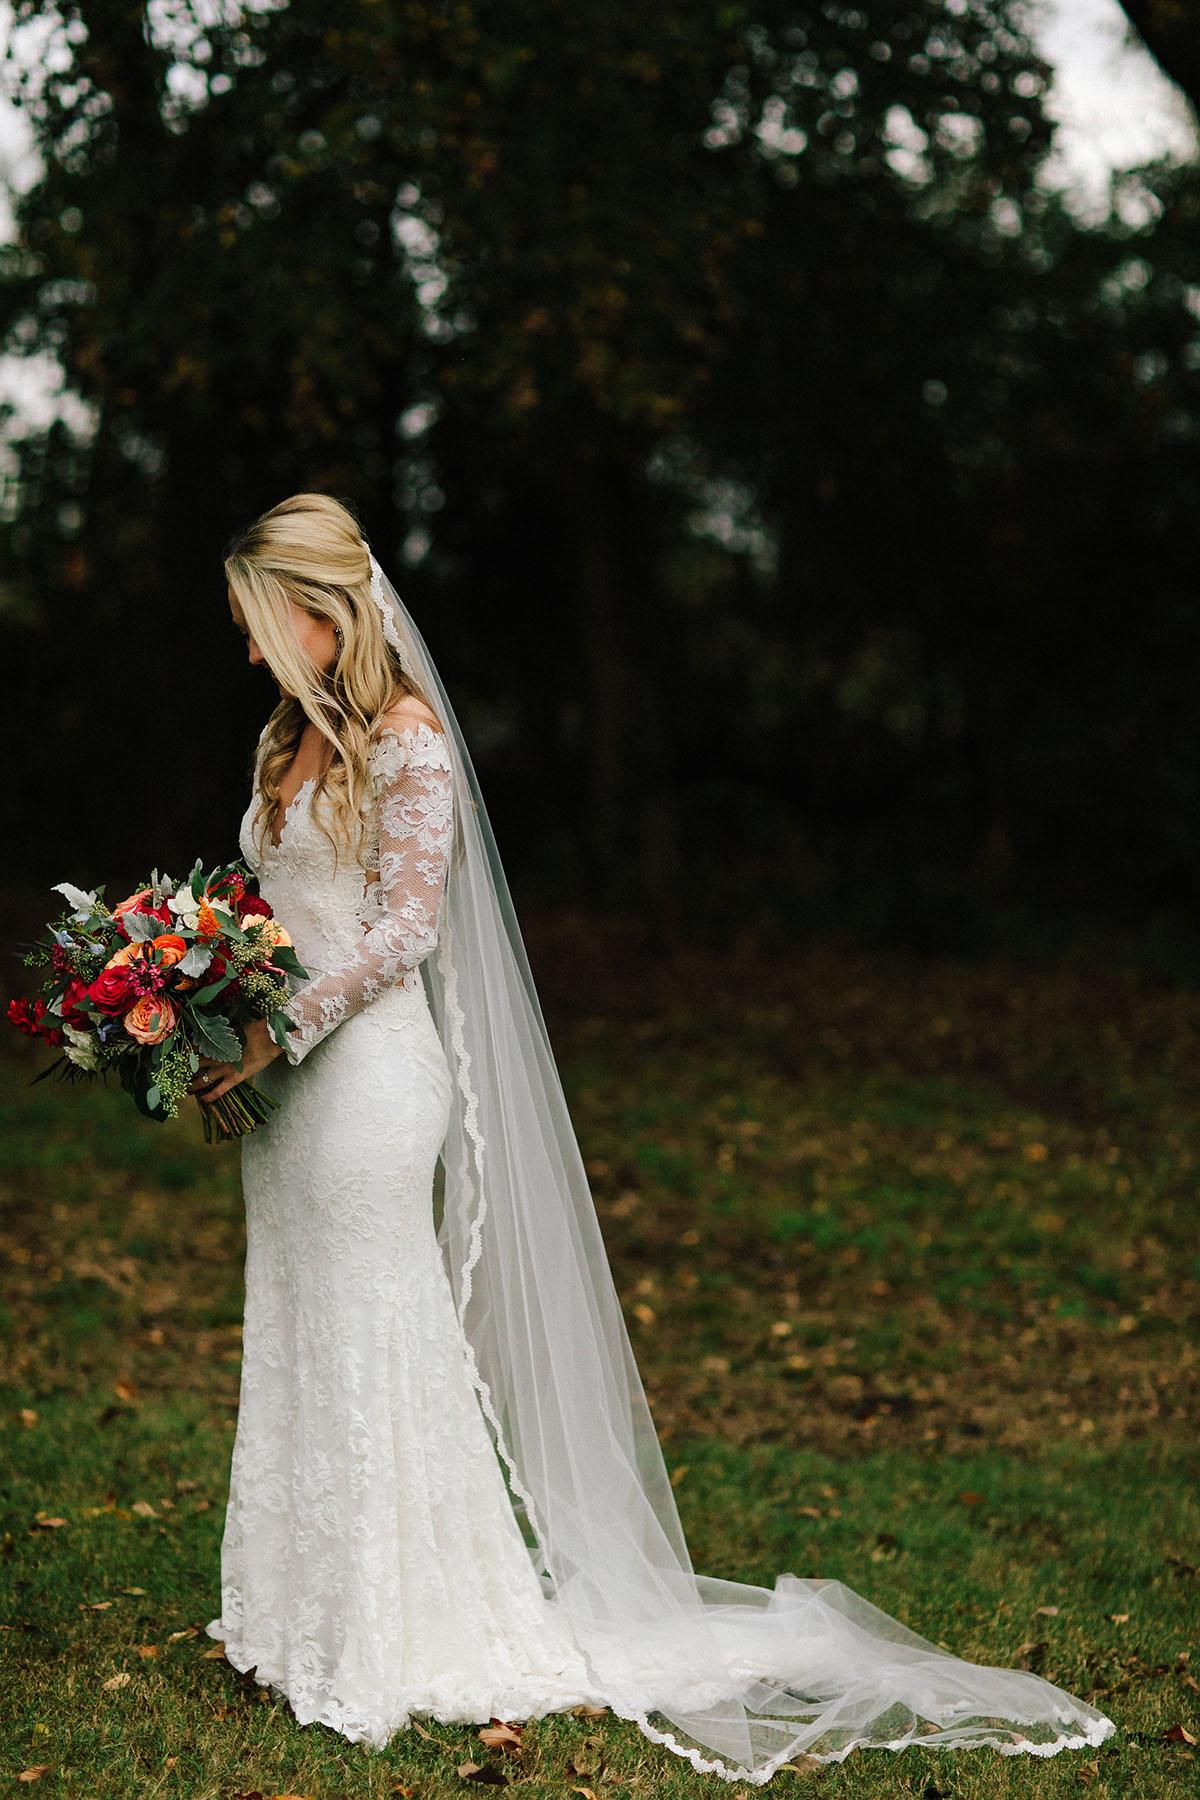 lauren_chad_wedding-79.jpg